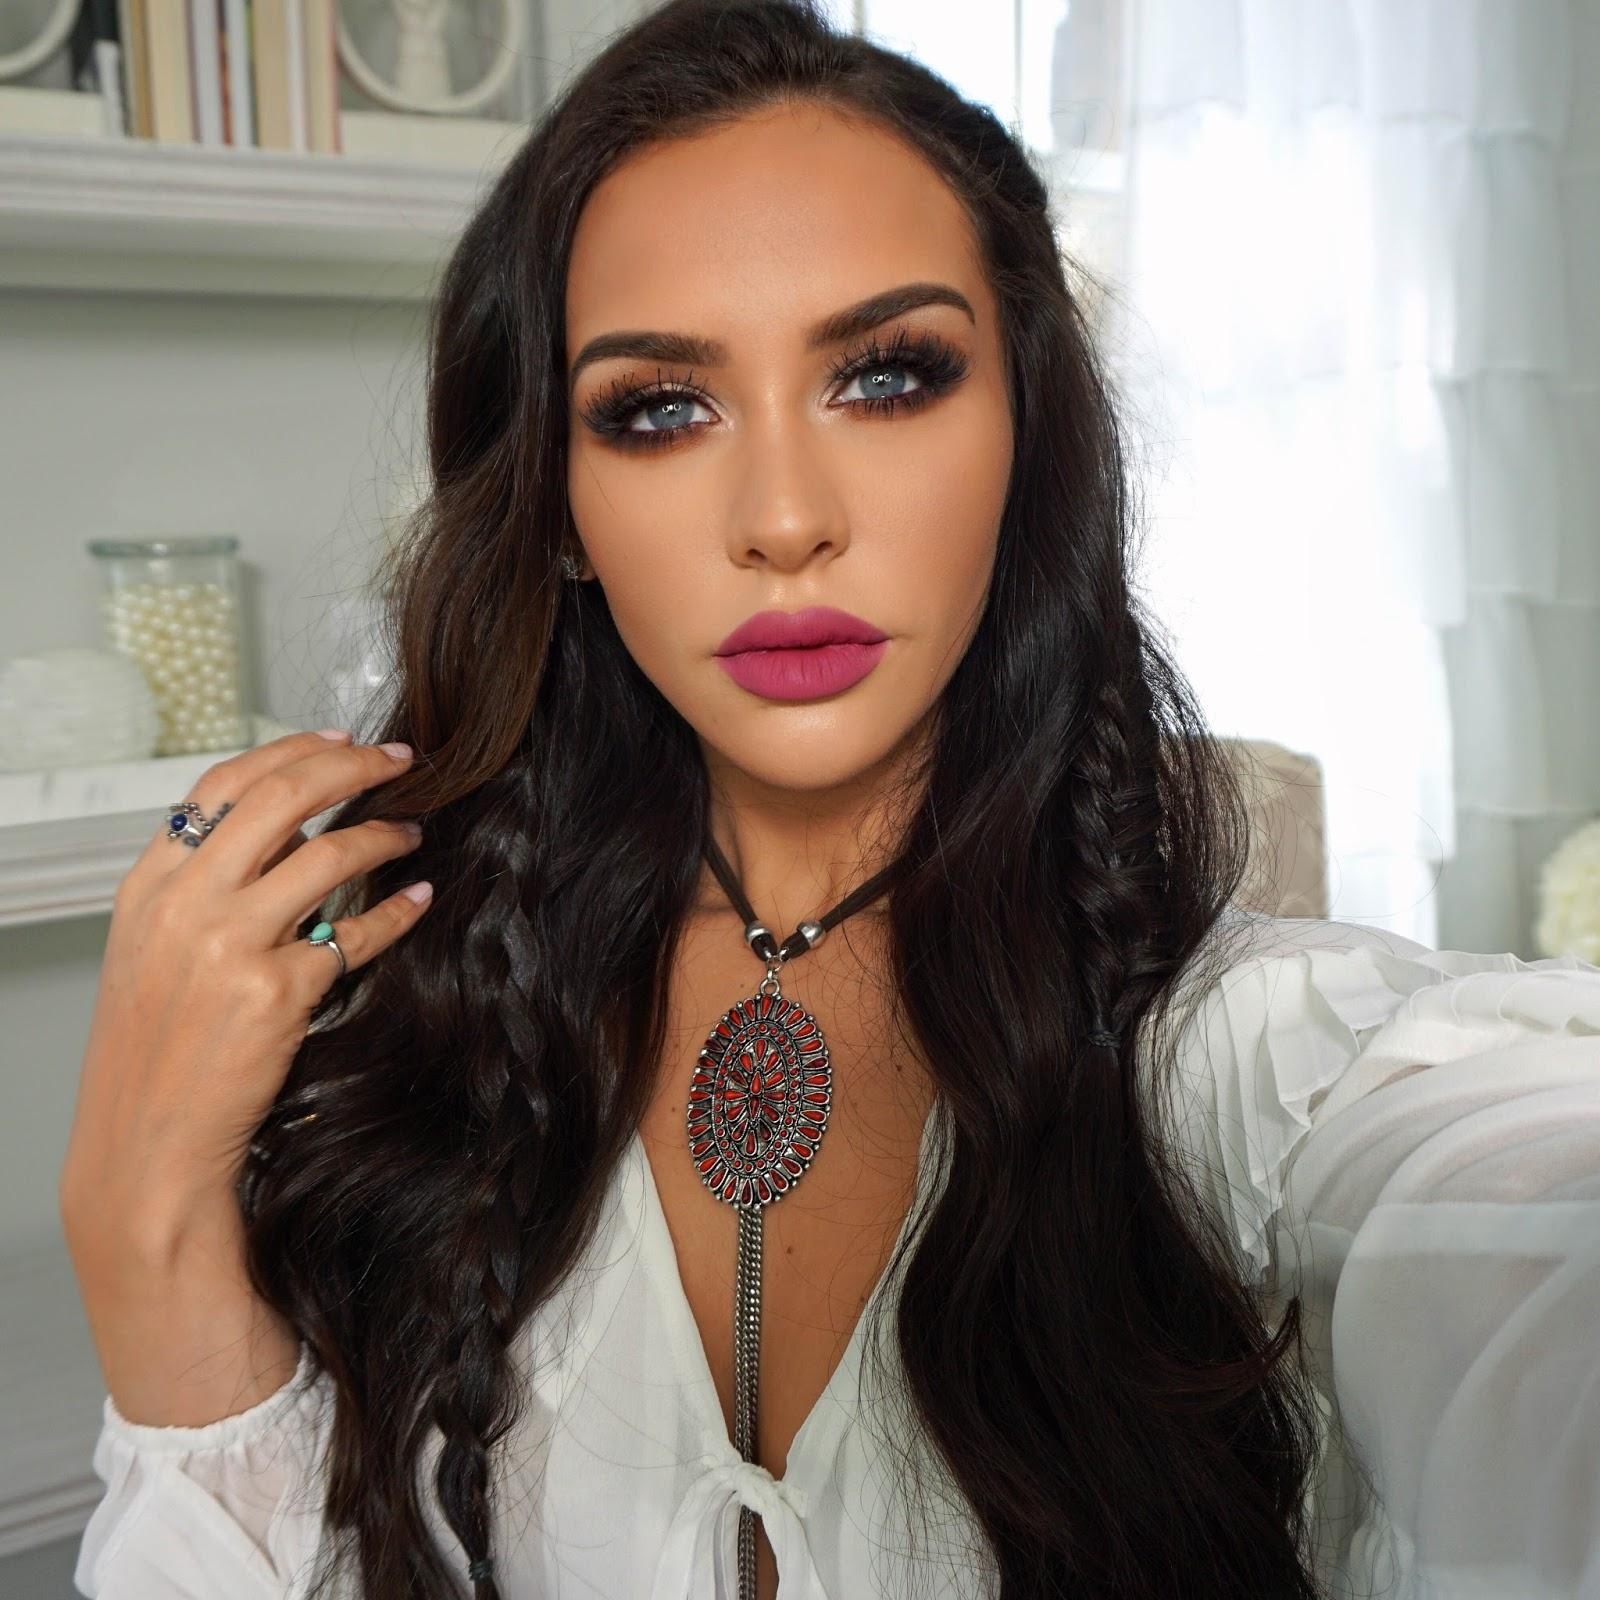 BOHO CHIC Makeup & Hair Tutorial